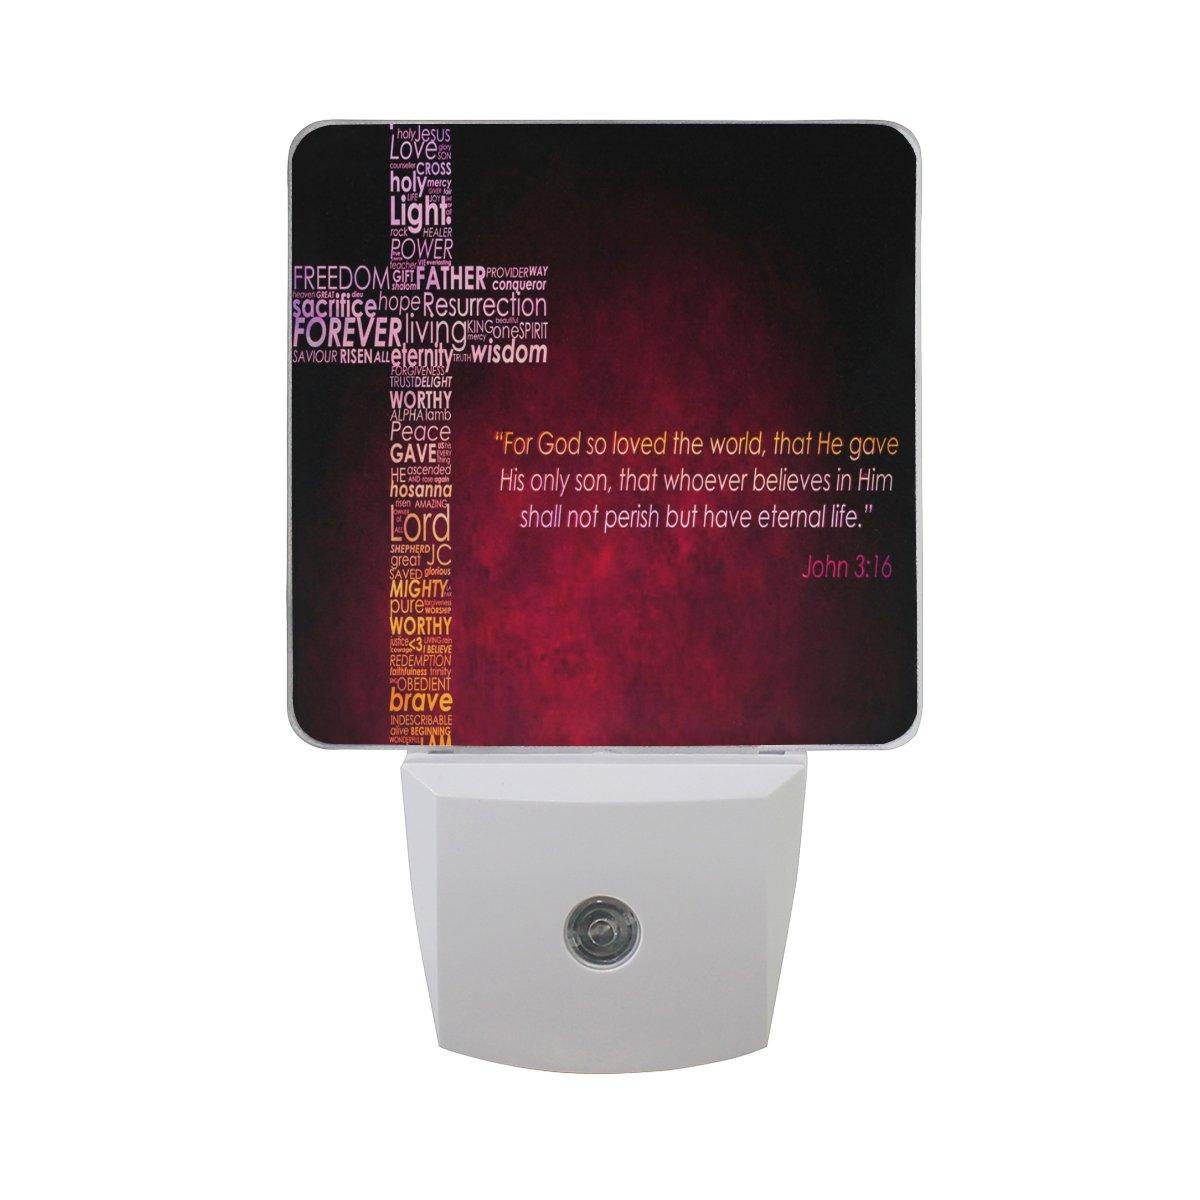 LEDVIE Christ Christian Cross Plug in Dusk to Dawn Light Sensor LED Night Light Wall Light for Bedroom, Baby's Kids Room,Hallway, Stairs, Energy Efficient